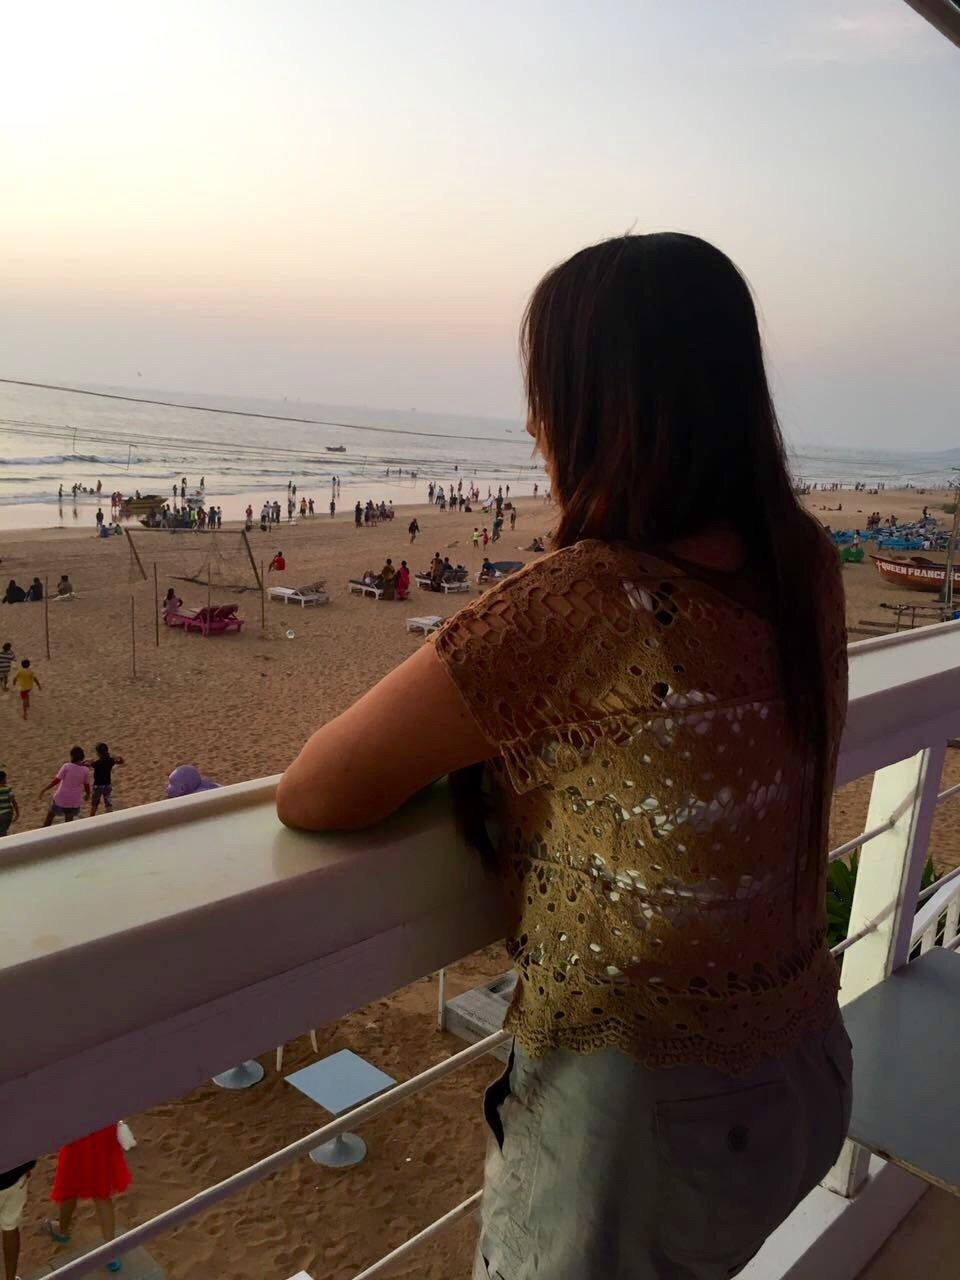 #travel #beach #beachlove #goa #indiantraveller #indianblogger #travelbloggerindia #fashionbloggerindia #stylishme #fashion #sunset #viewfromthetop #fashionblogger #fashionblogger